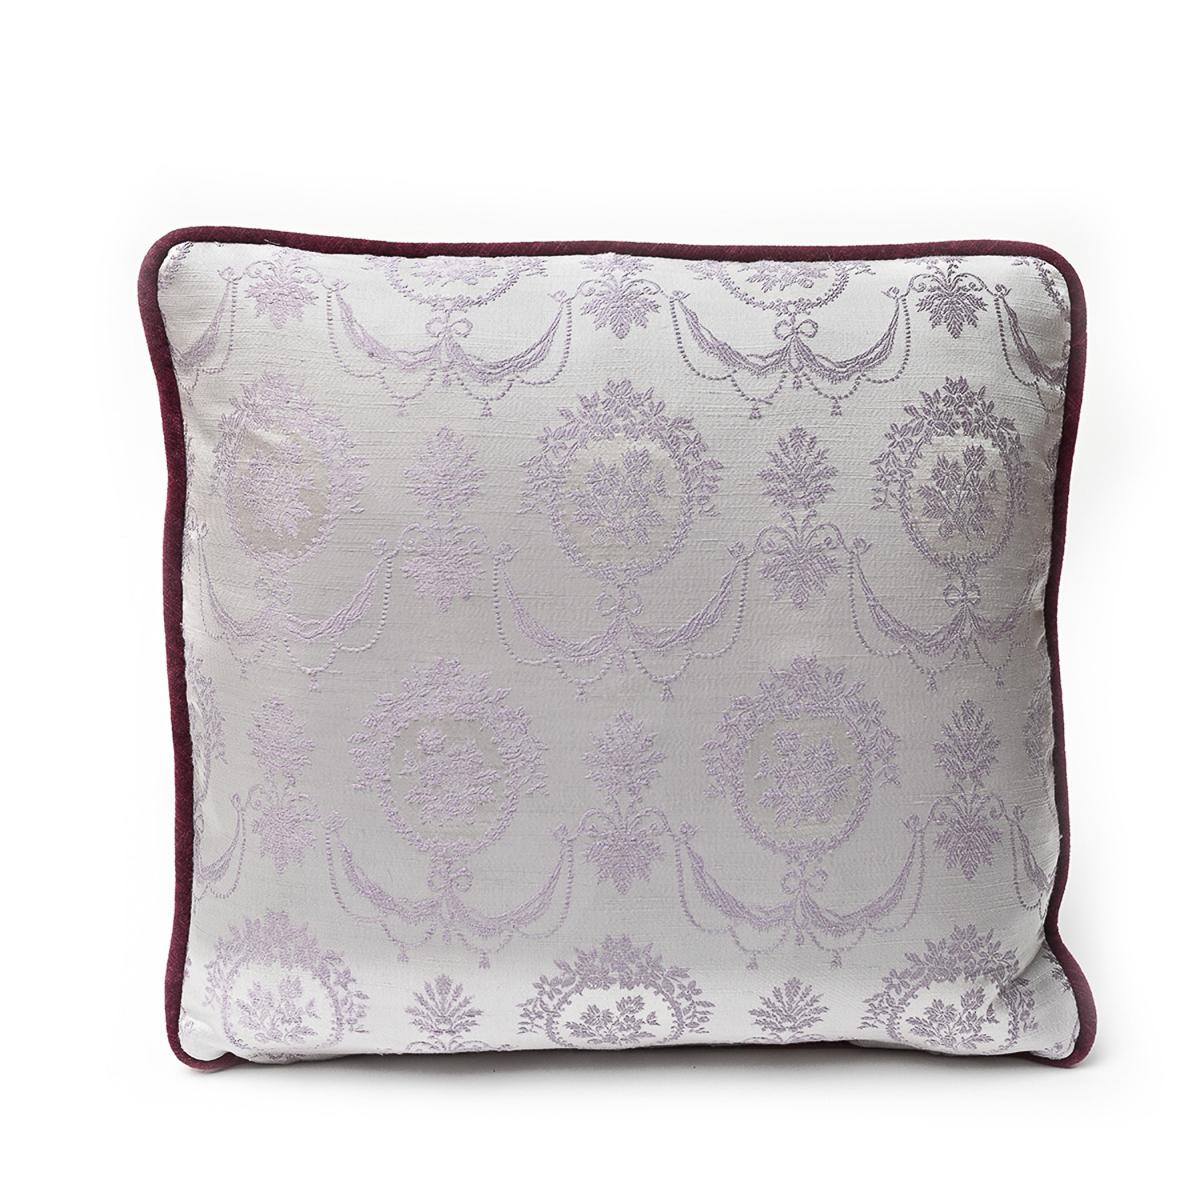 Lilac Bouquet – Single Pillow, Pair available – 18″ x 18″